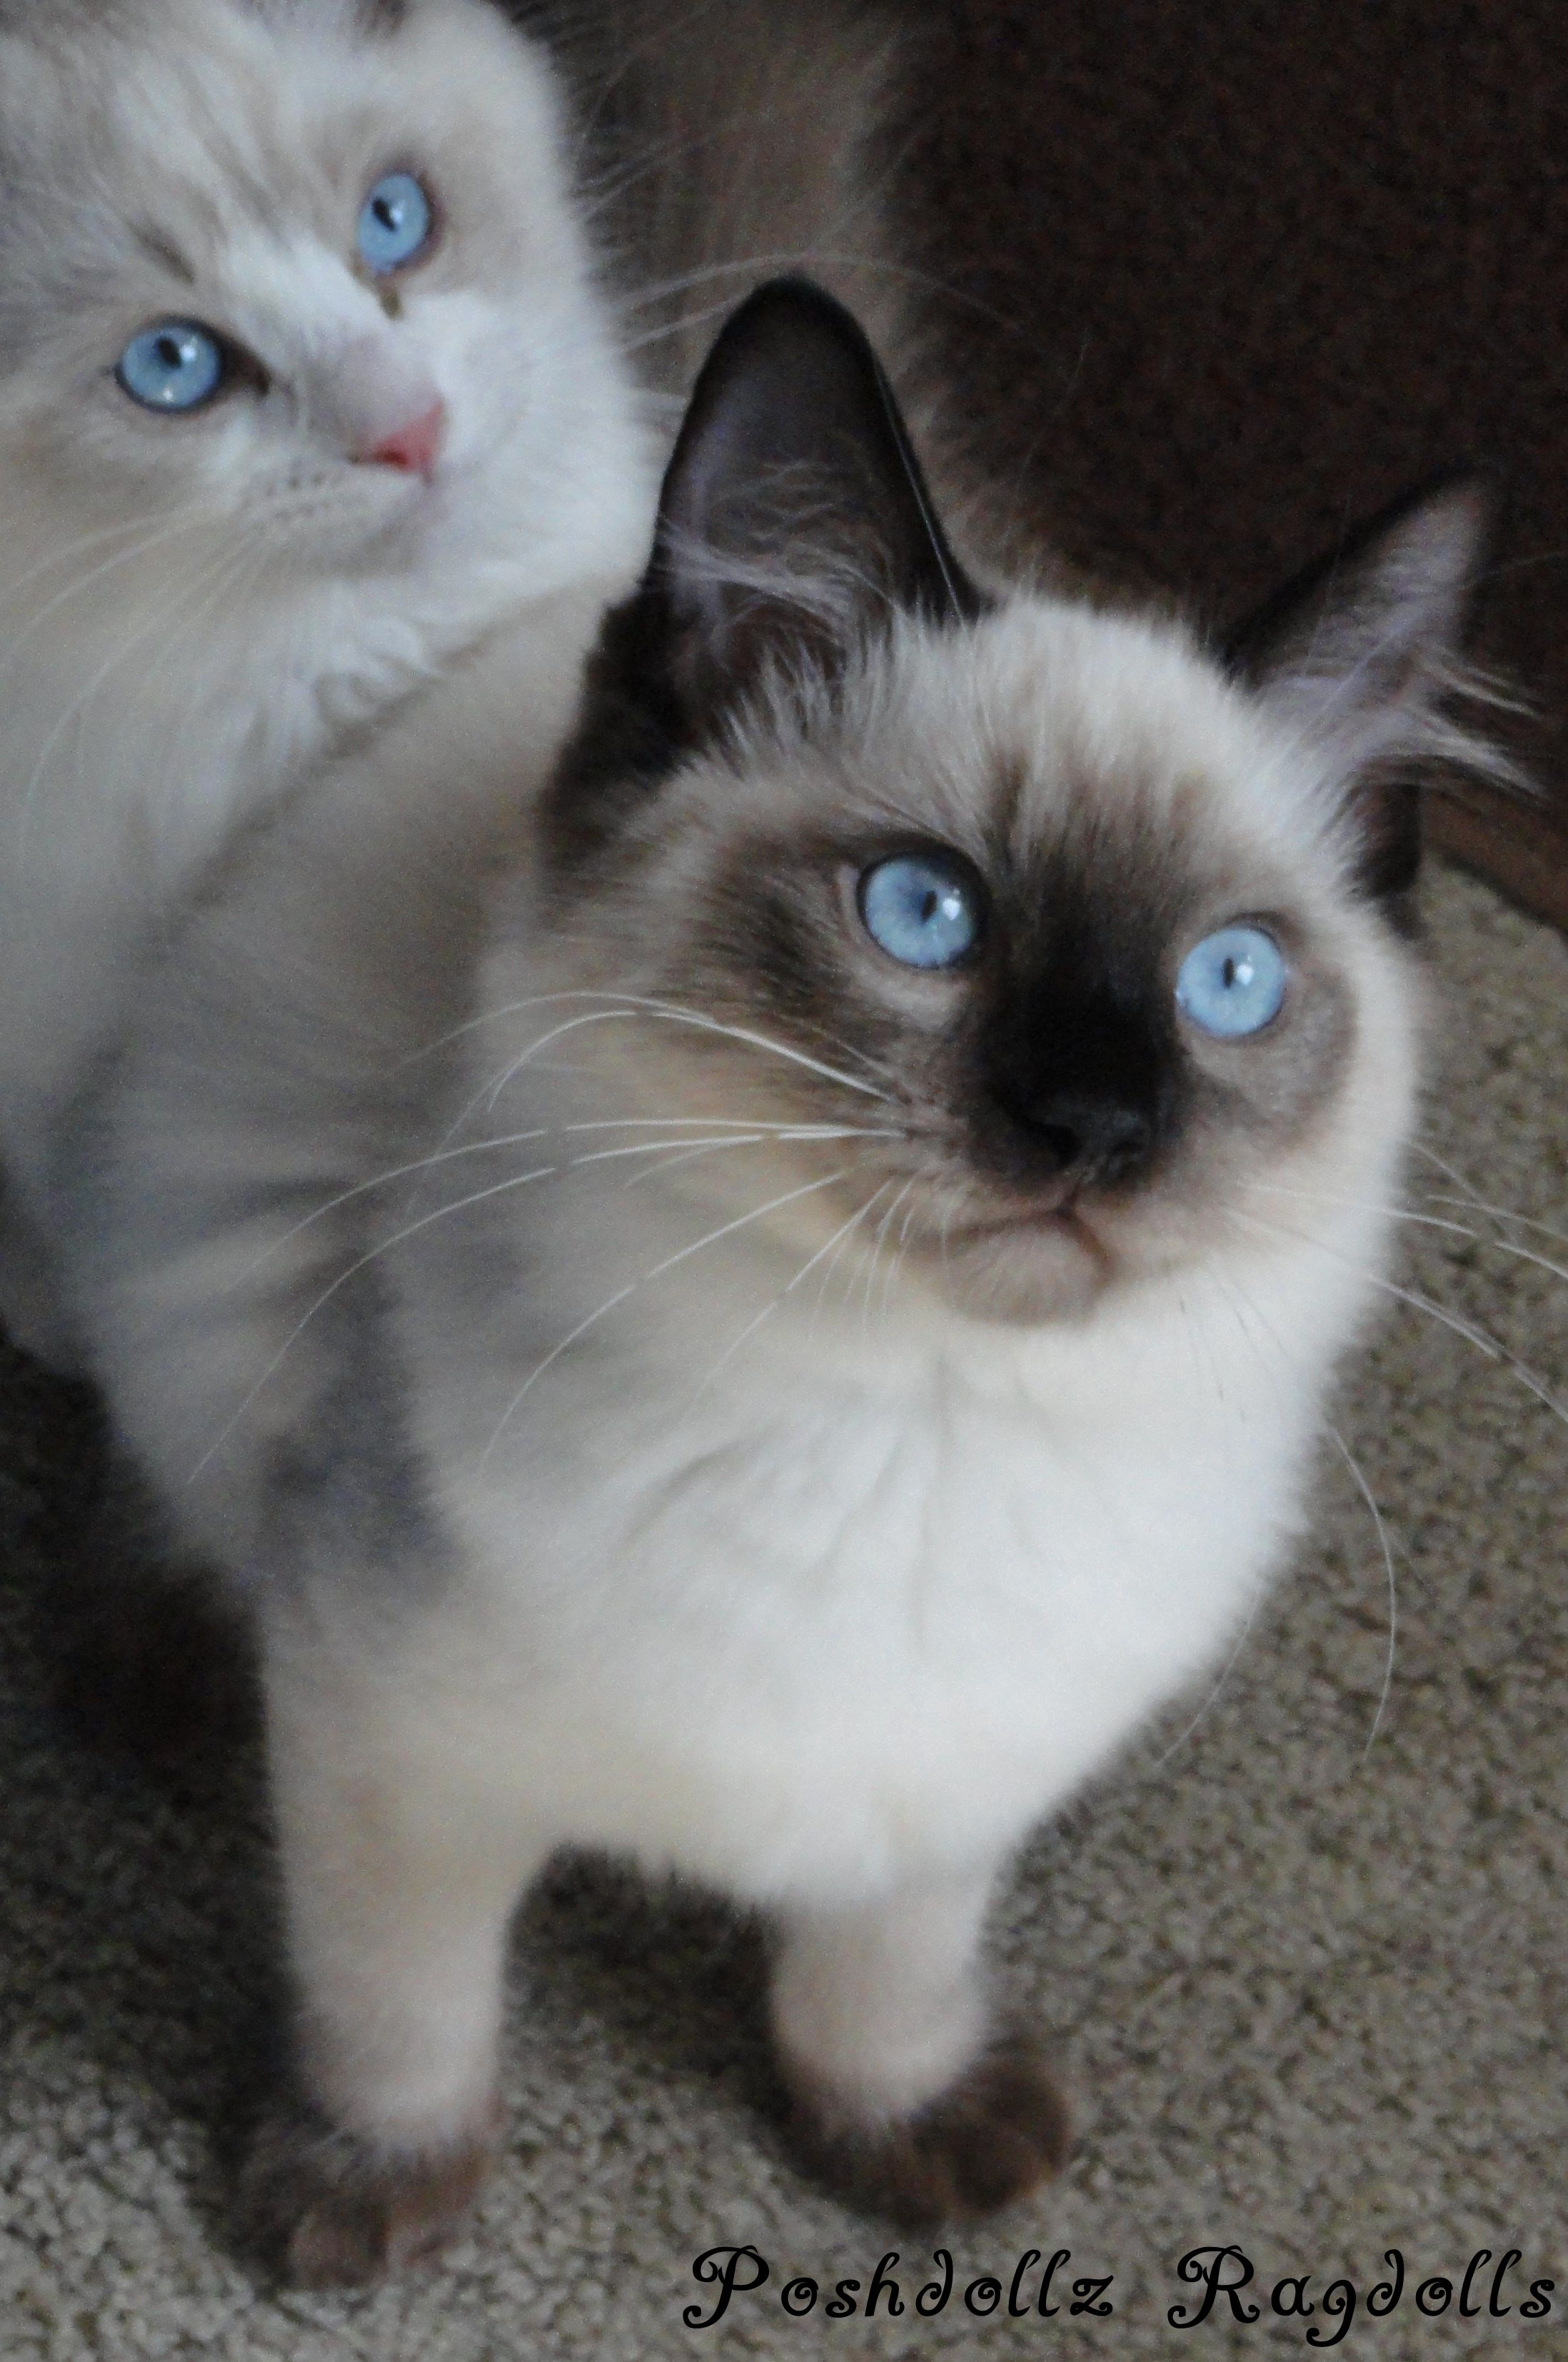 Seal Colorpoint Ragdoll Kitten POSHDOLLZ RAGDOLLS